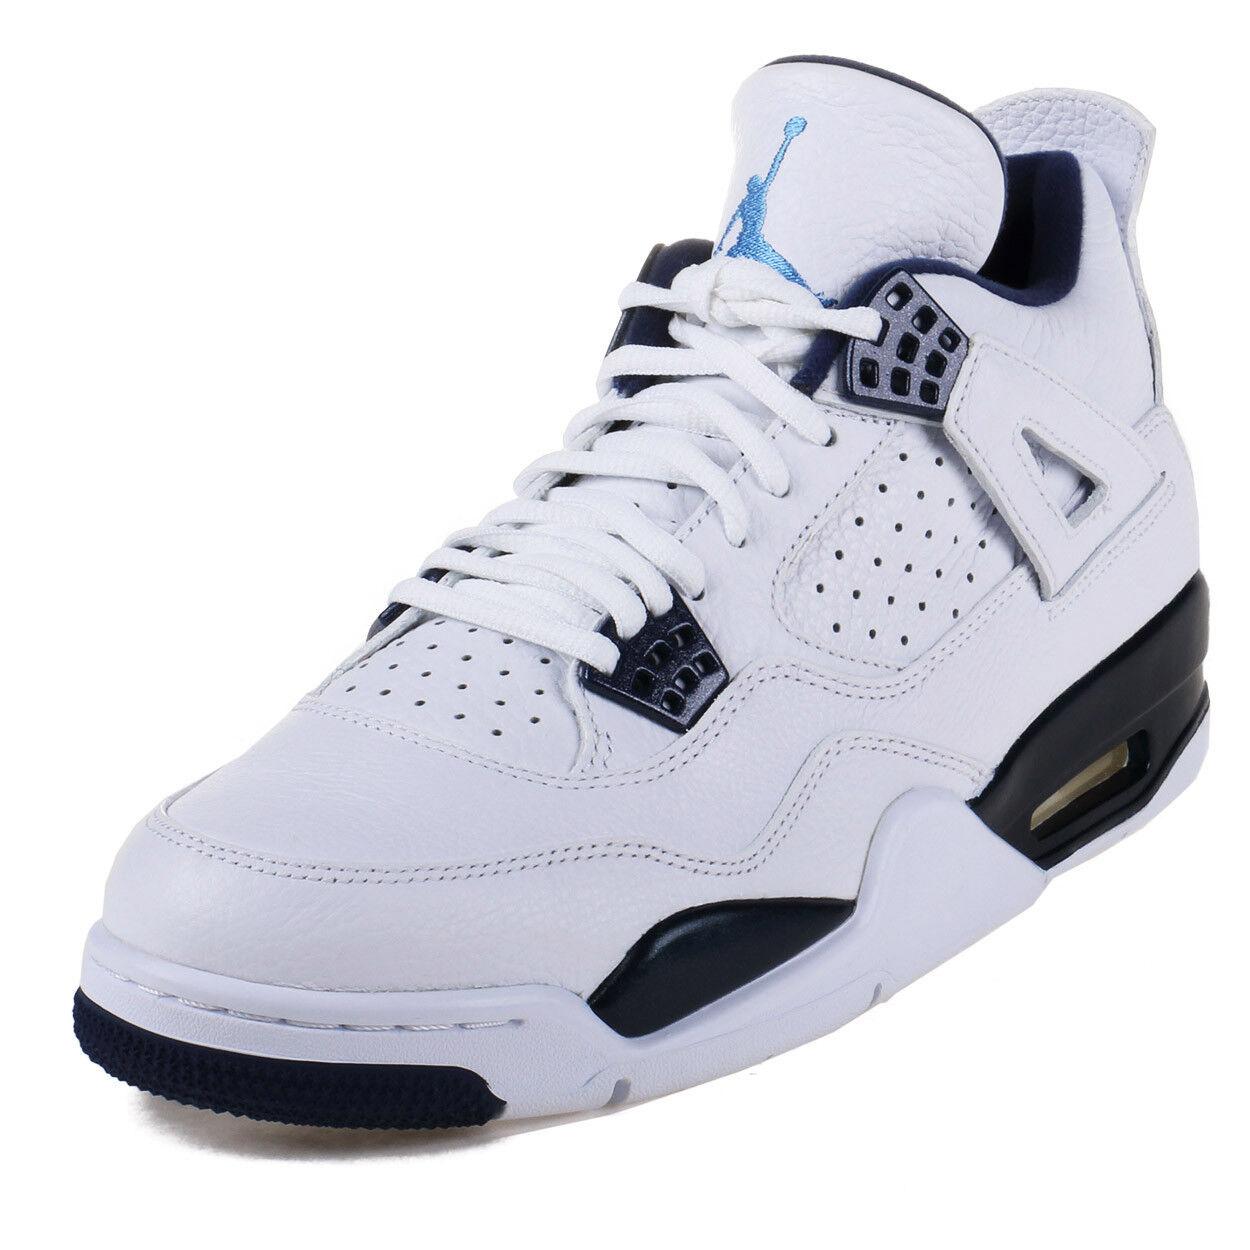 Nike homme Air Jordan 4 Retro LS